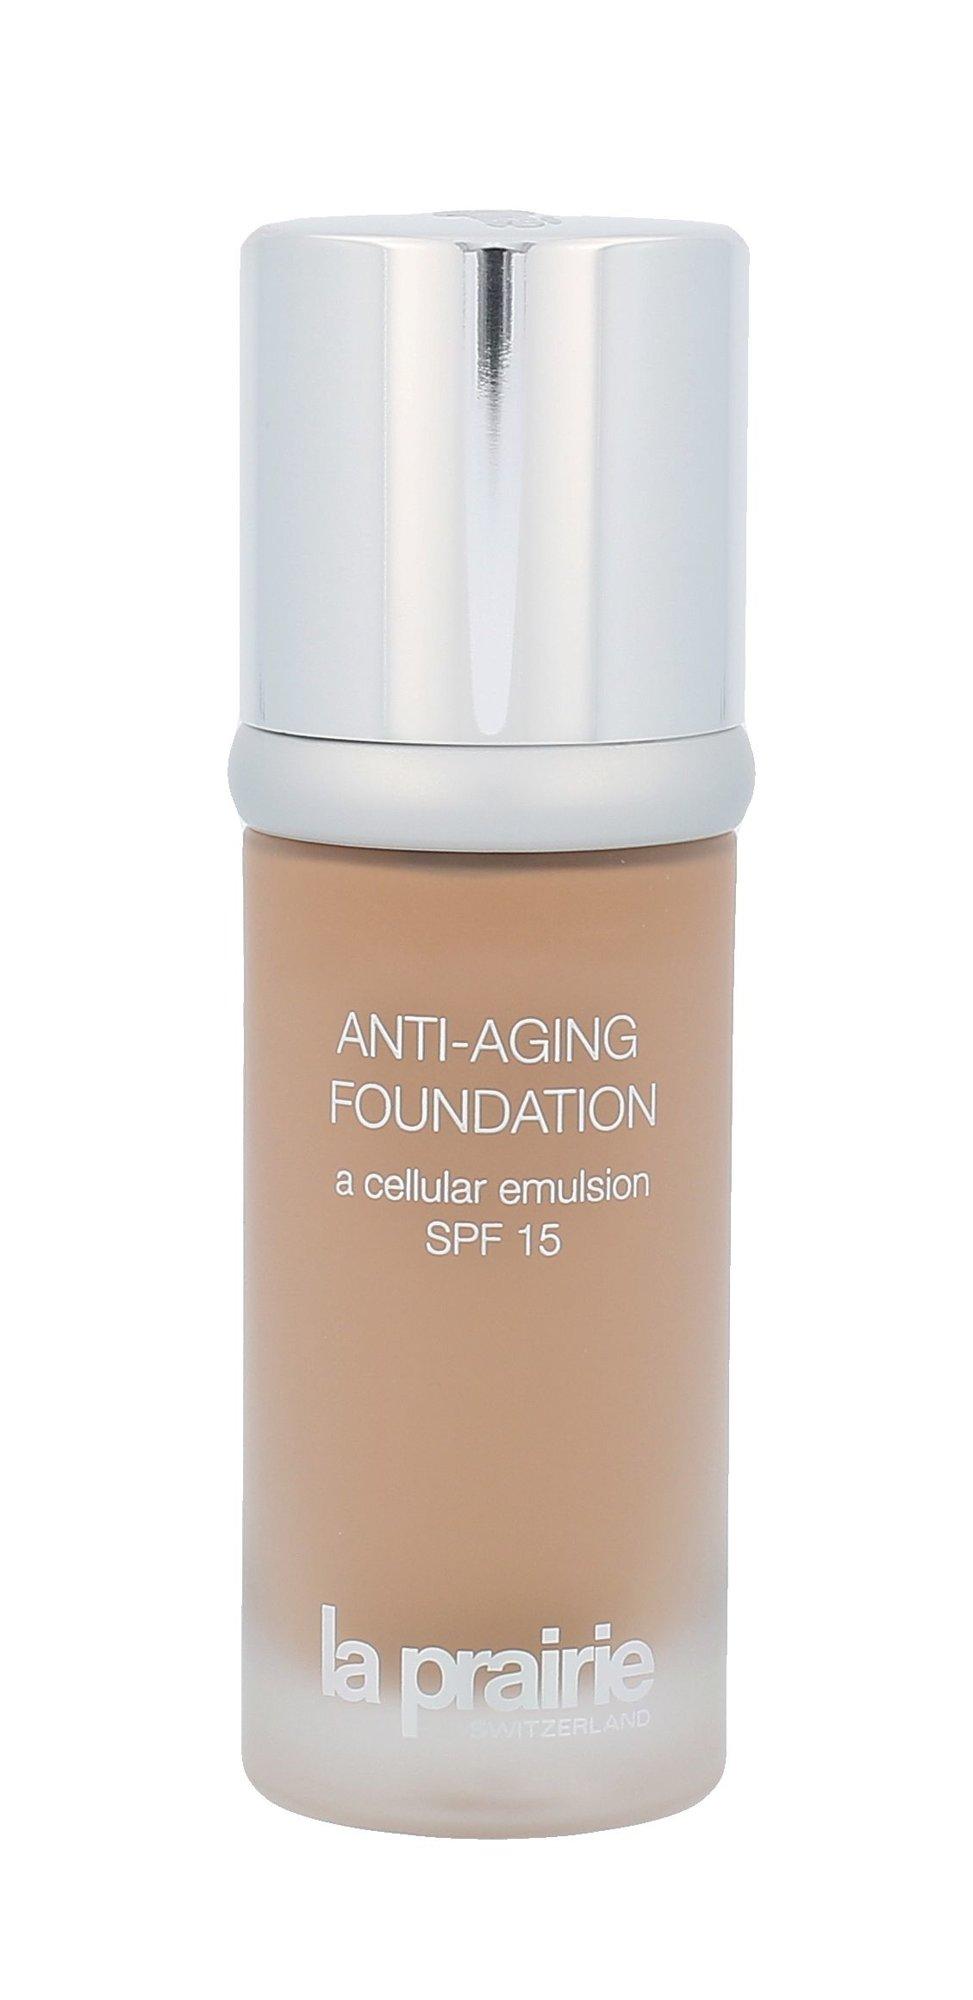 La Prairie Anti Aging Foundation SPF15 Cosmetic 30ml Shade 700